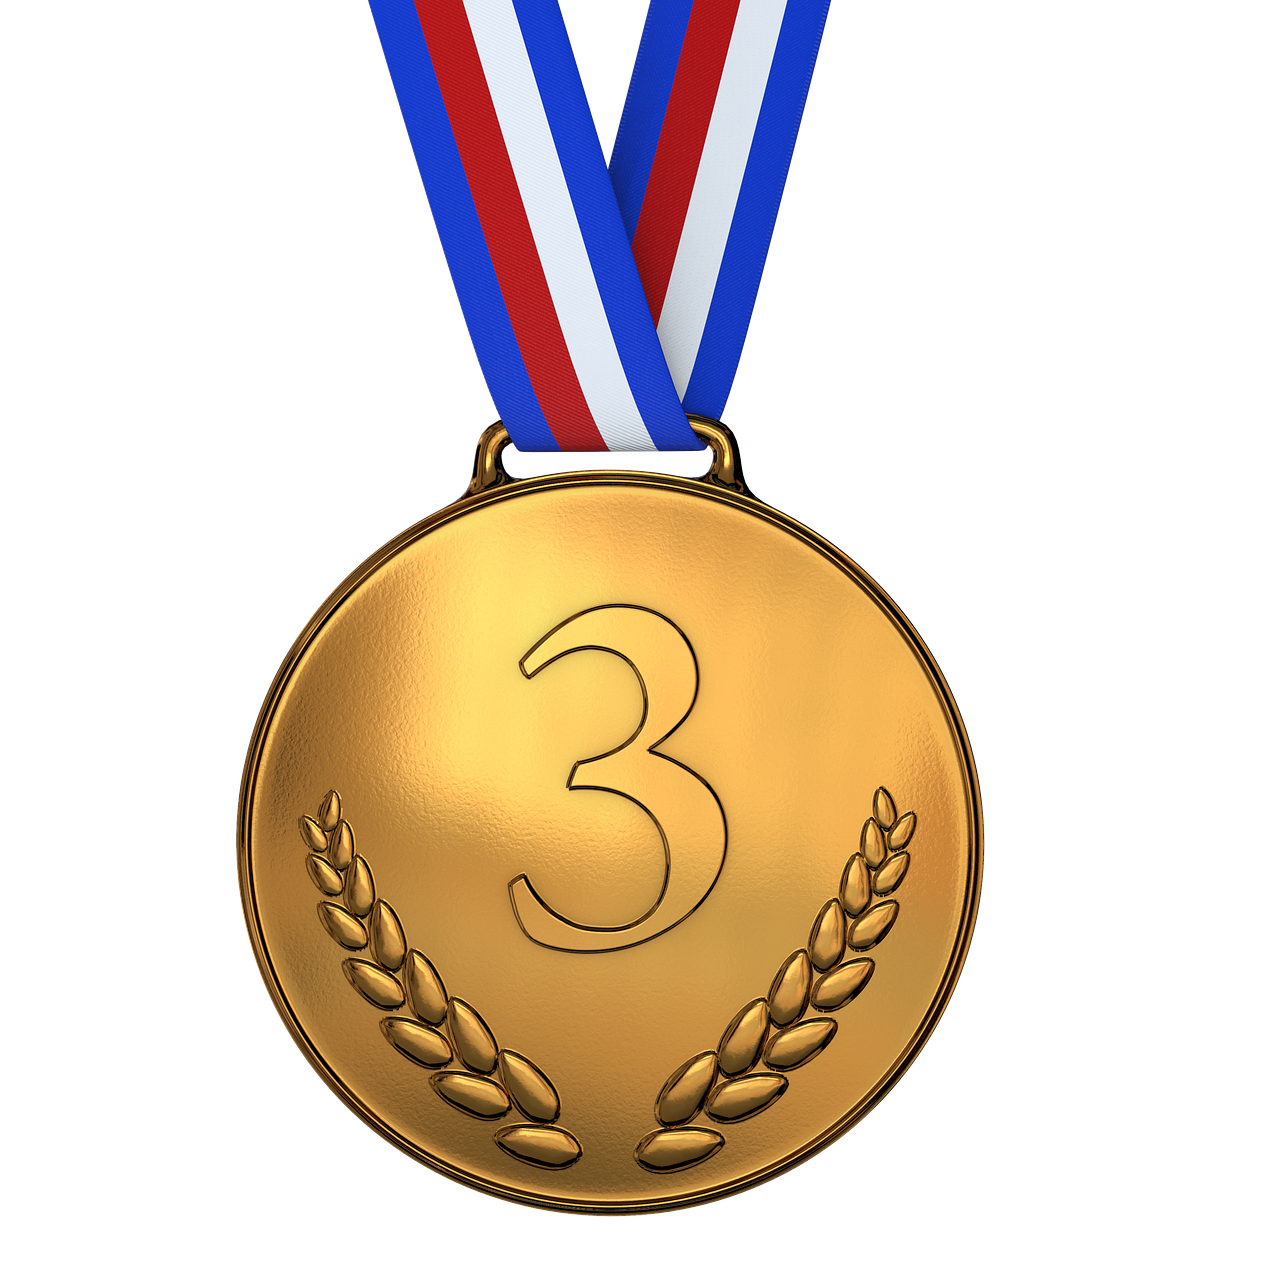 medal, bronze, award